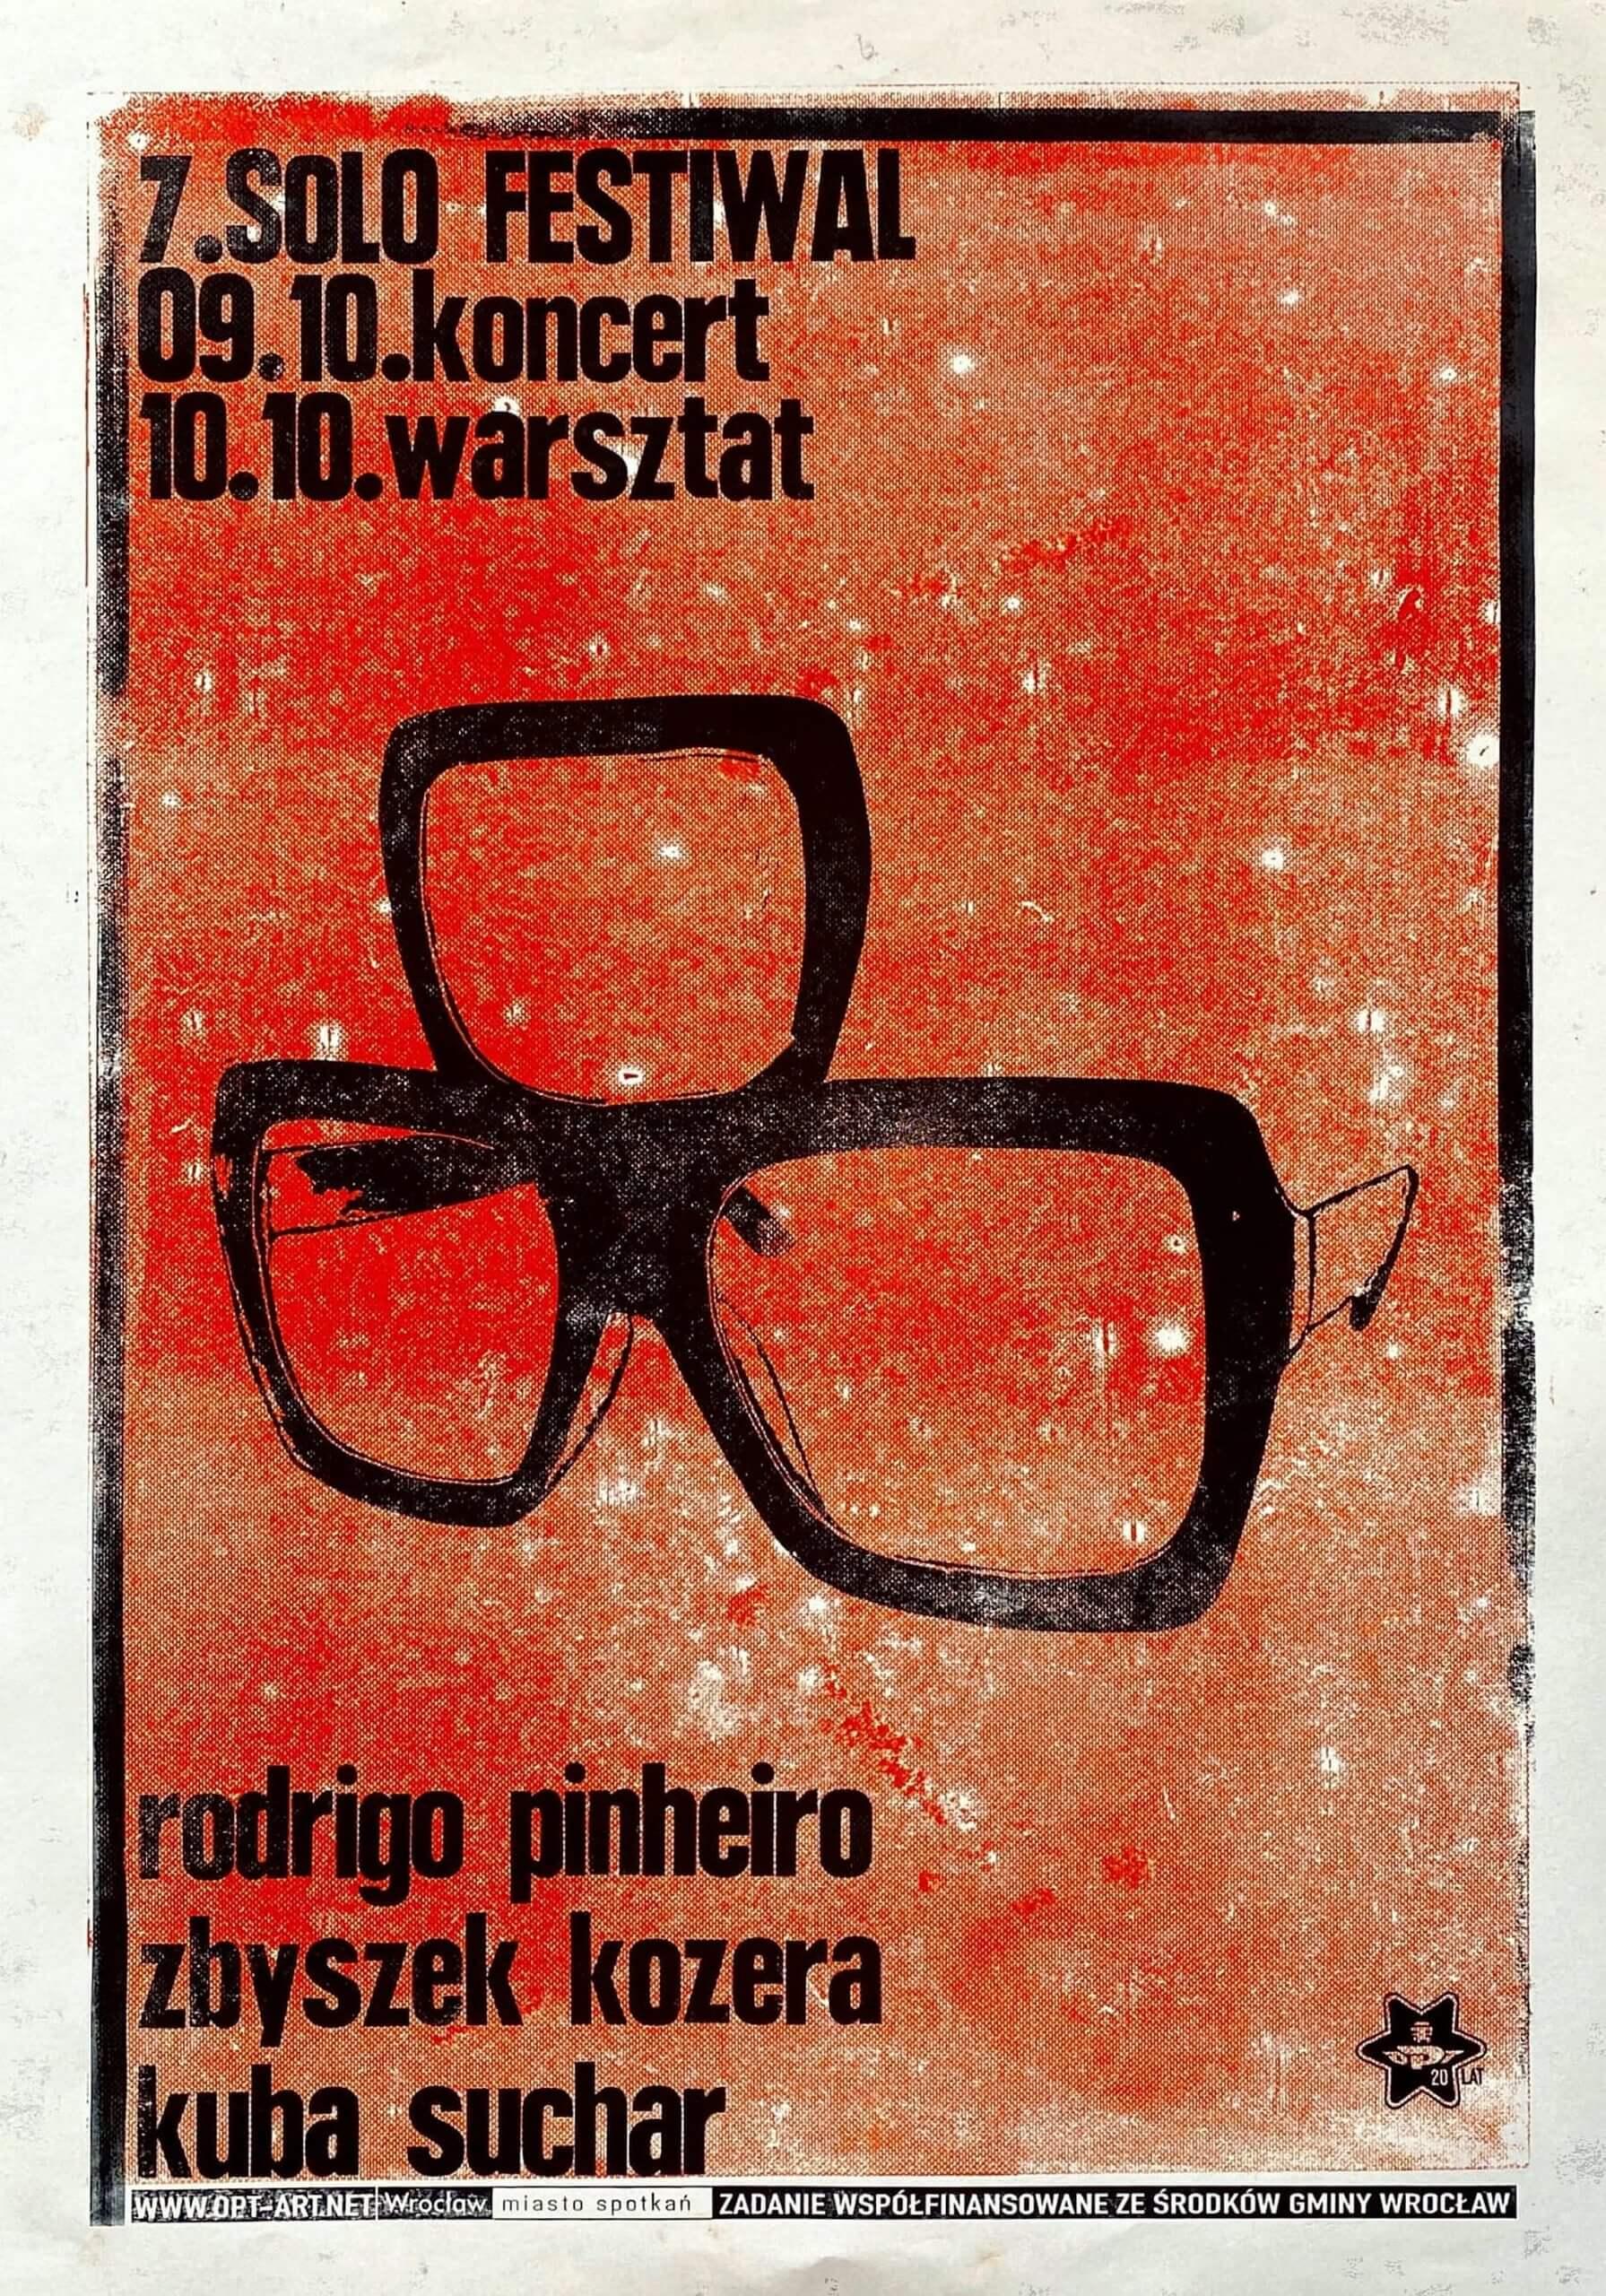 Rodrigo Pinheiro / Zbyszek Kozera / Kuba Suchar - Solo Festiwal (9-10 X 2021)